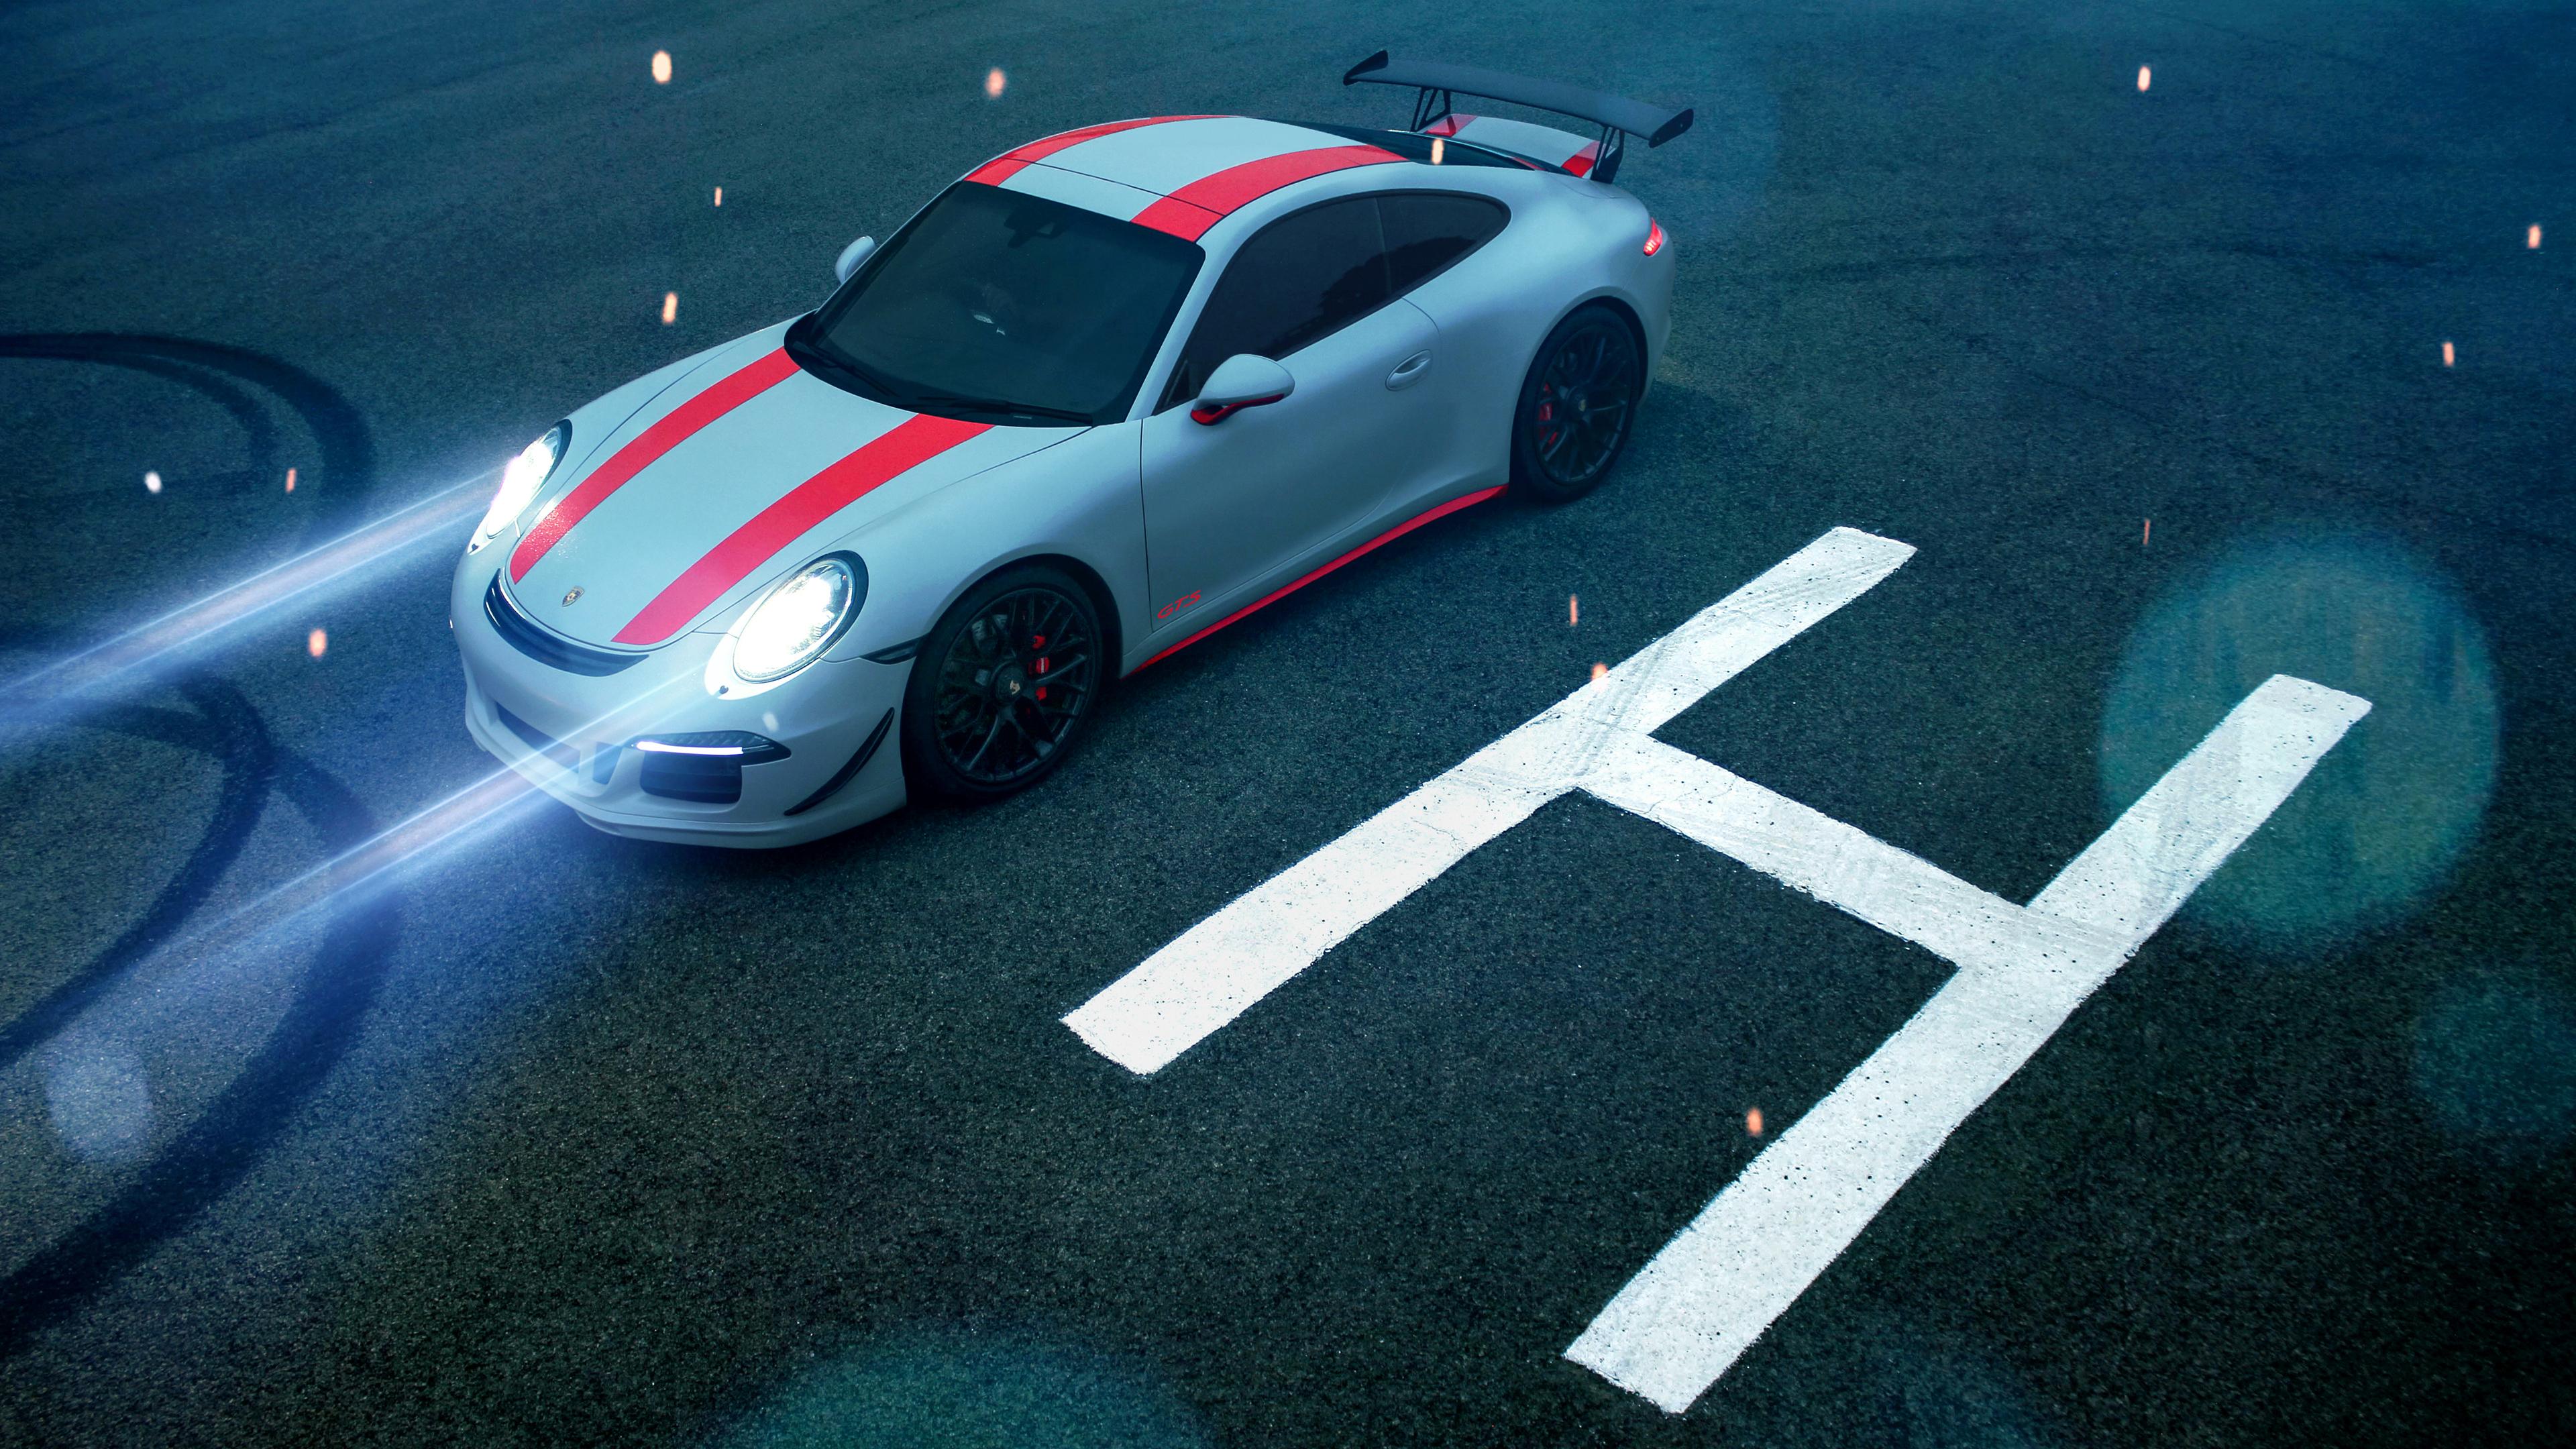 porsche 911 carrera gts upper view 1572661131 - Porsche 911 Carrera GTS Upper View - porsche wallpapers, porsche carrera wallpapers, hd-wallpapers, cars wallpapers, 4k-wallpapers, 2019 cars wallpapers